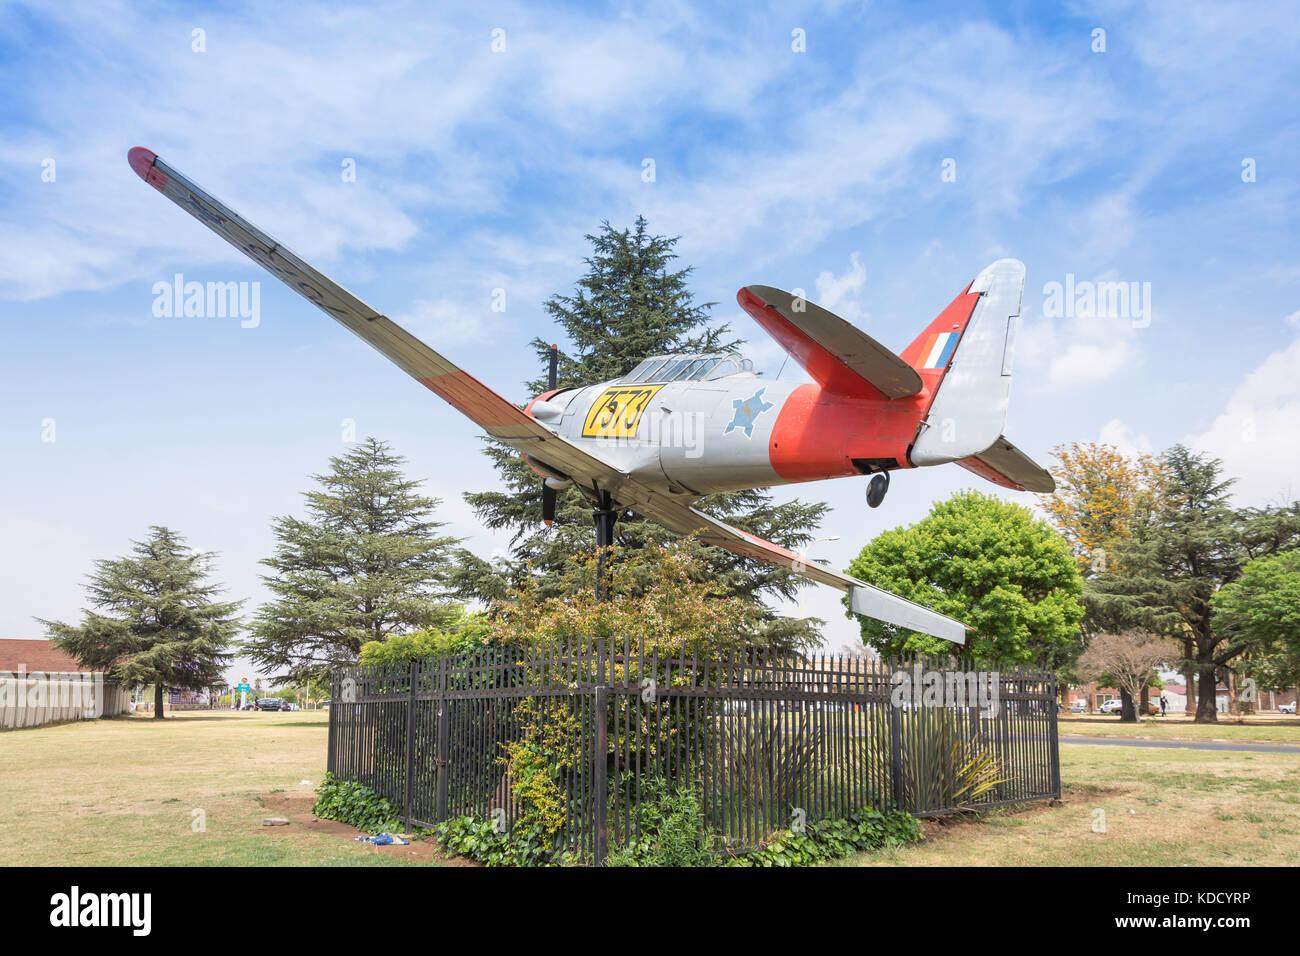 Harvard Aircraft Monument on green, Dunnottar, Nigel, Gauteng Province, Republic of South Africa - Stock Image